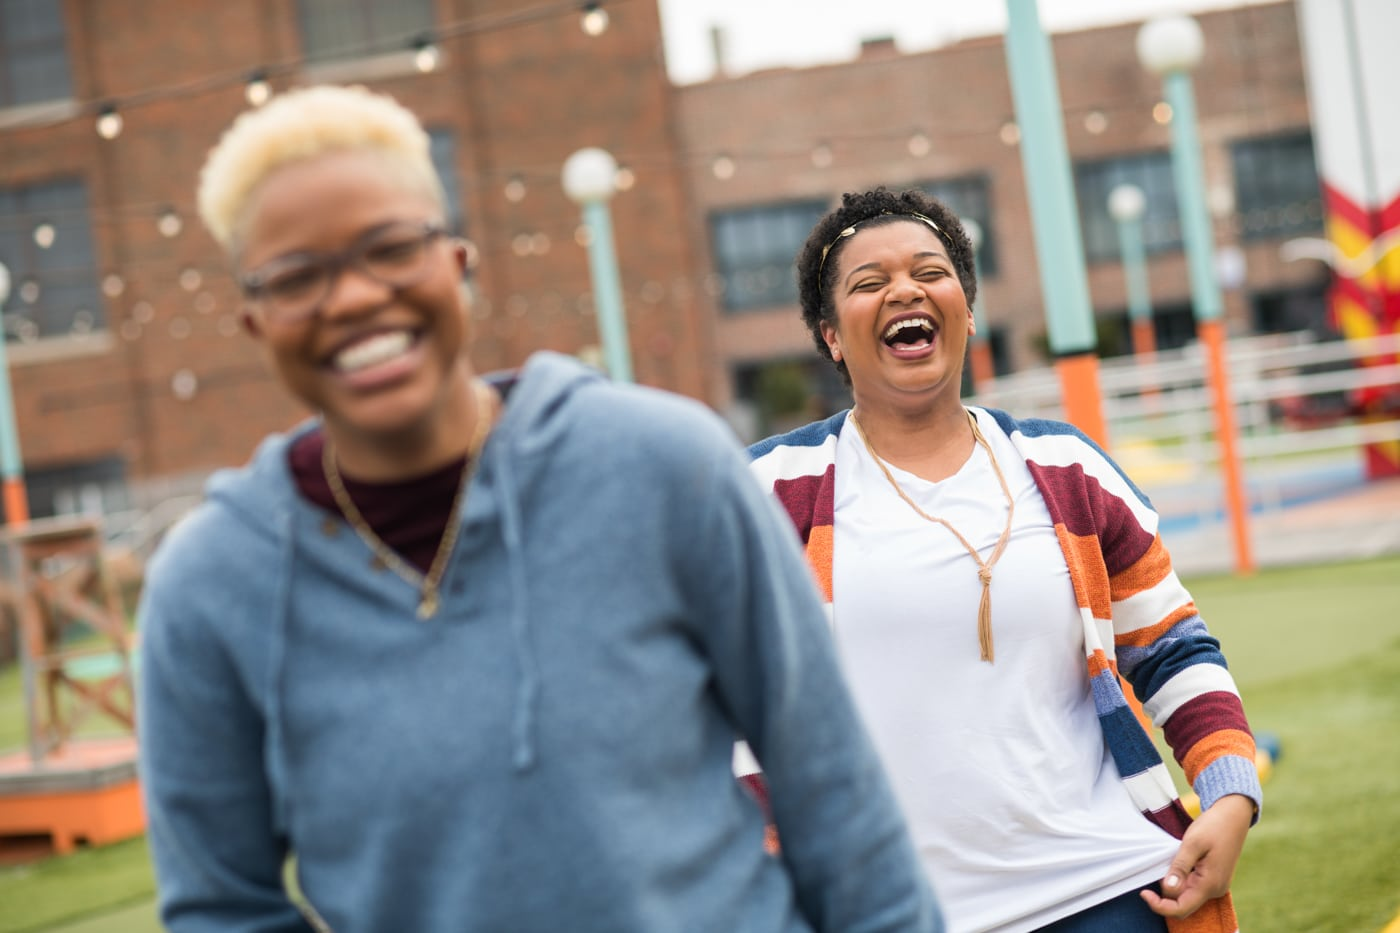 couple laughs together during Atlanta portrait session